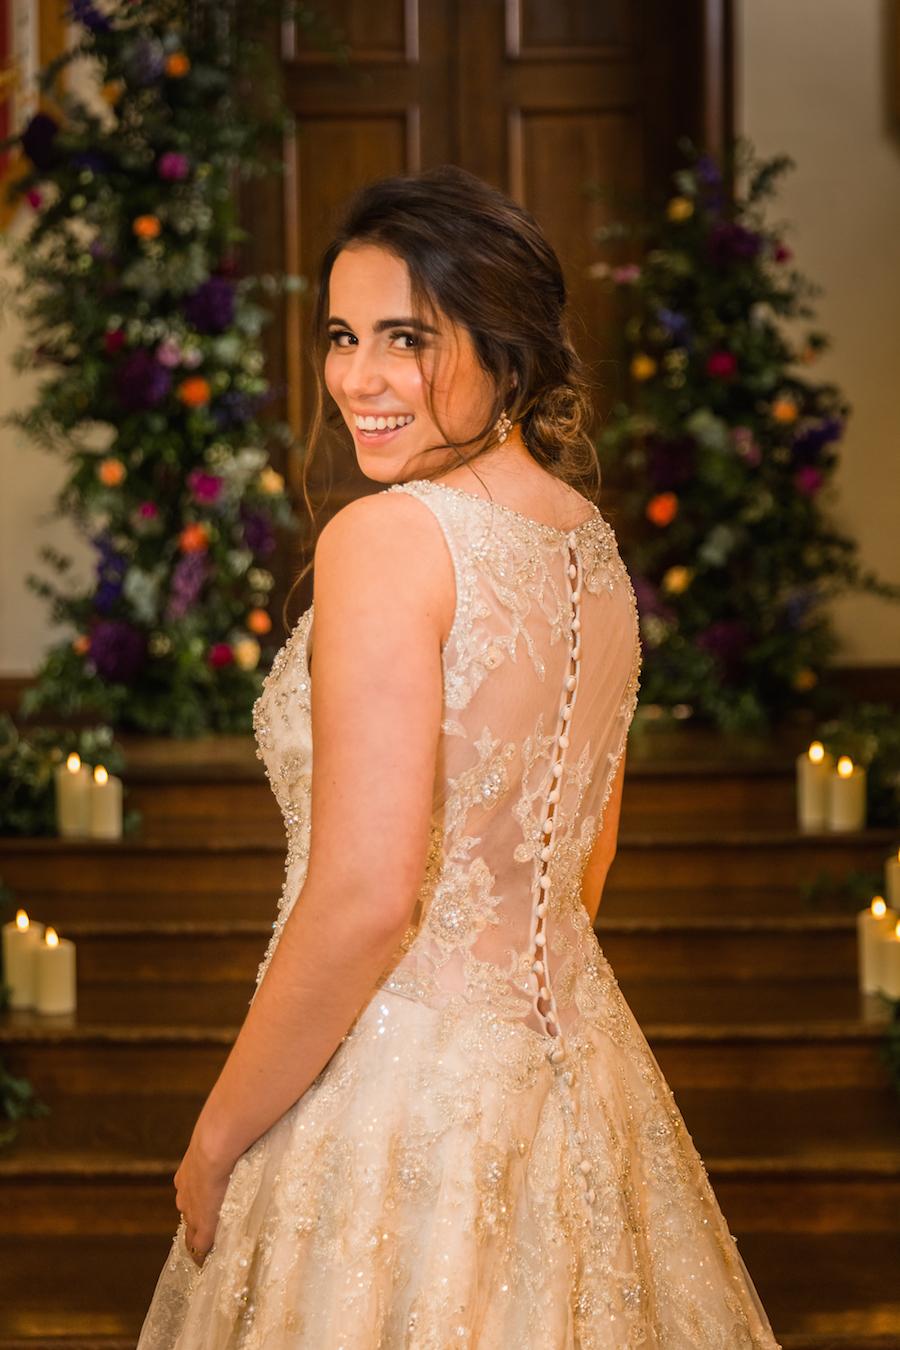 Jewel toned autumn wedding vibes from Layer Marney, image credit Ayshea Goldberg Photography (40)